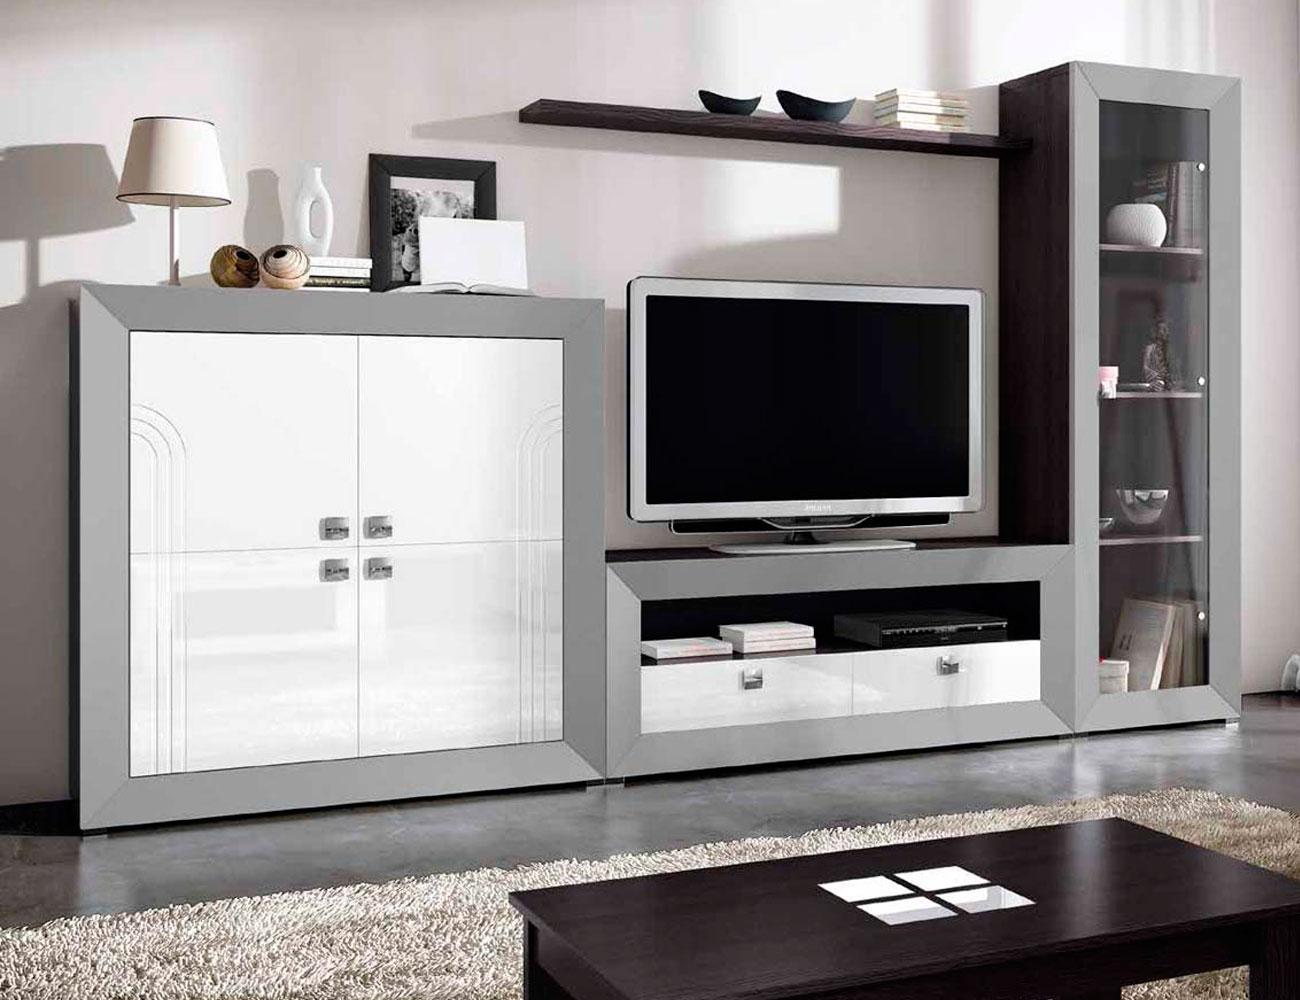 Mueble salon moderno 04